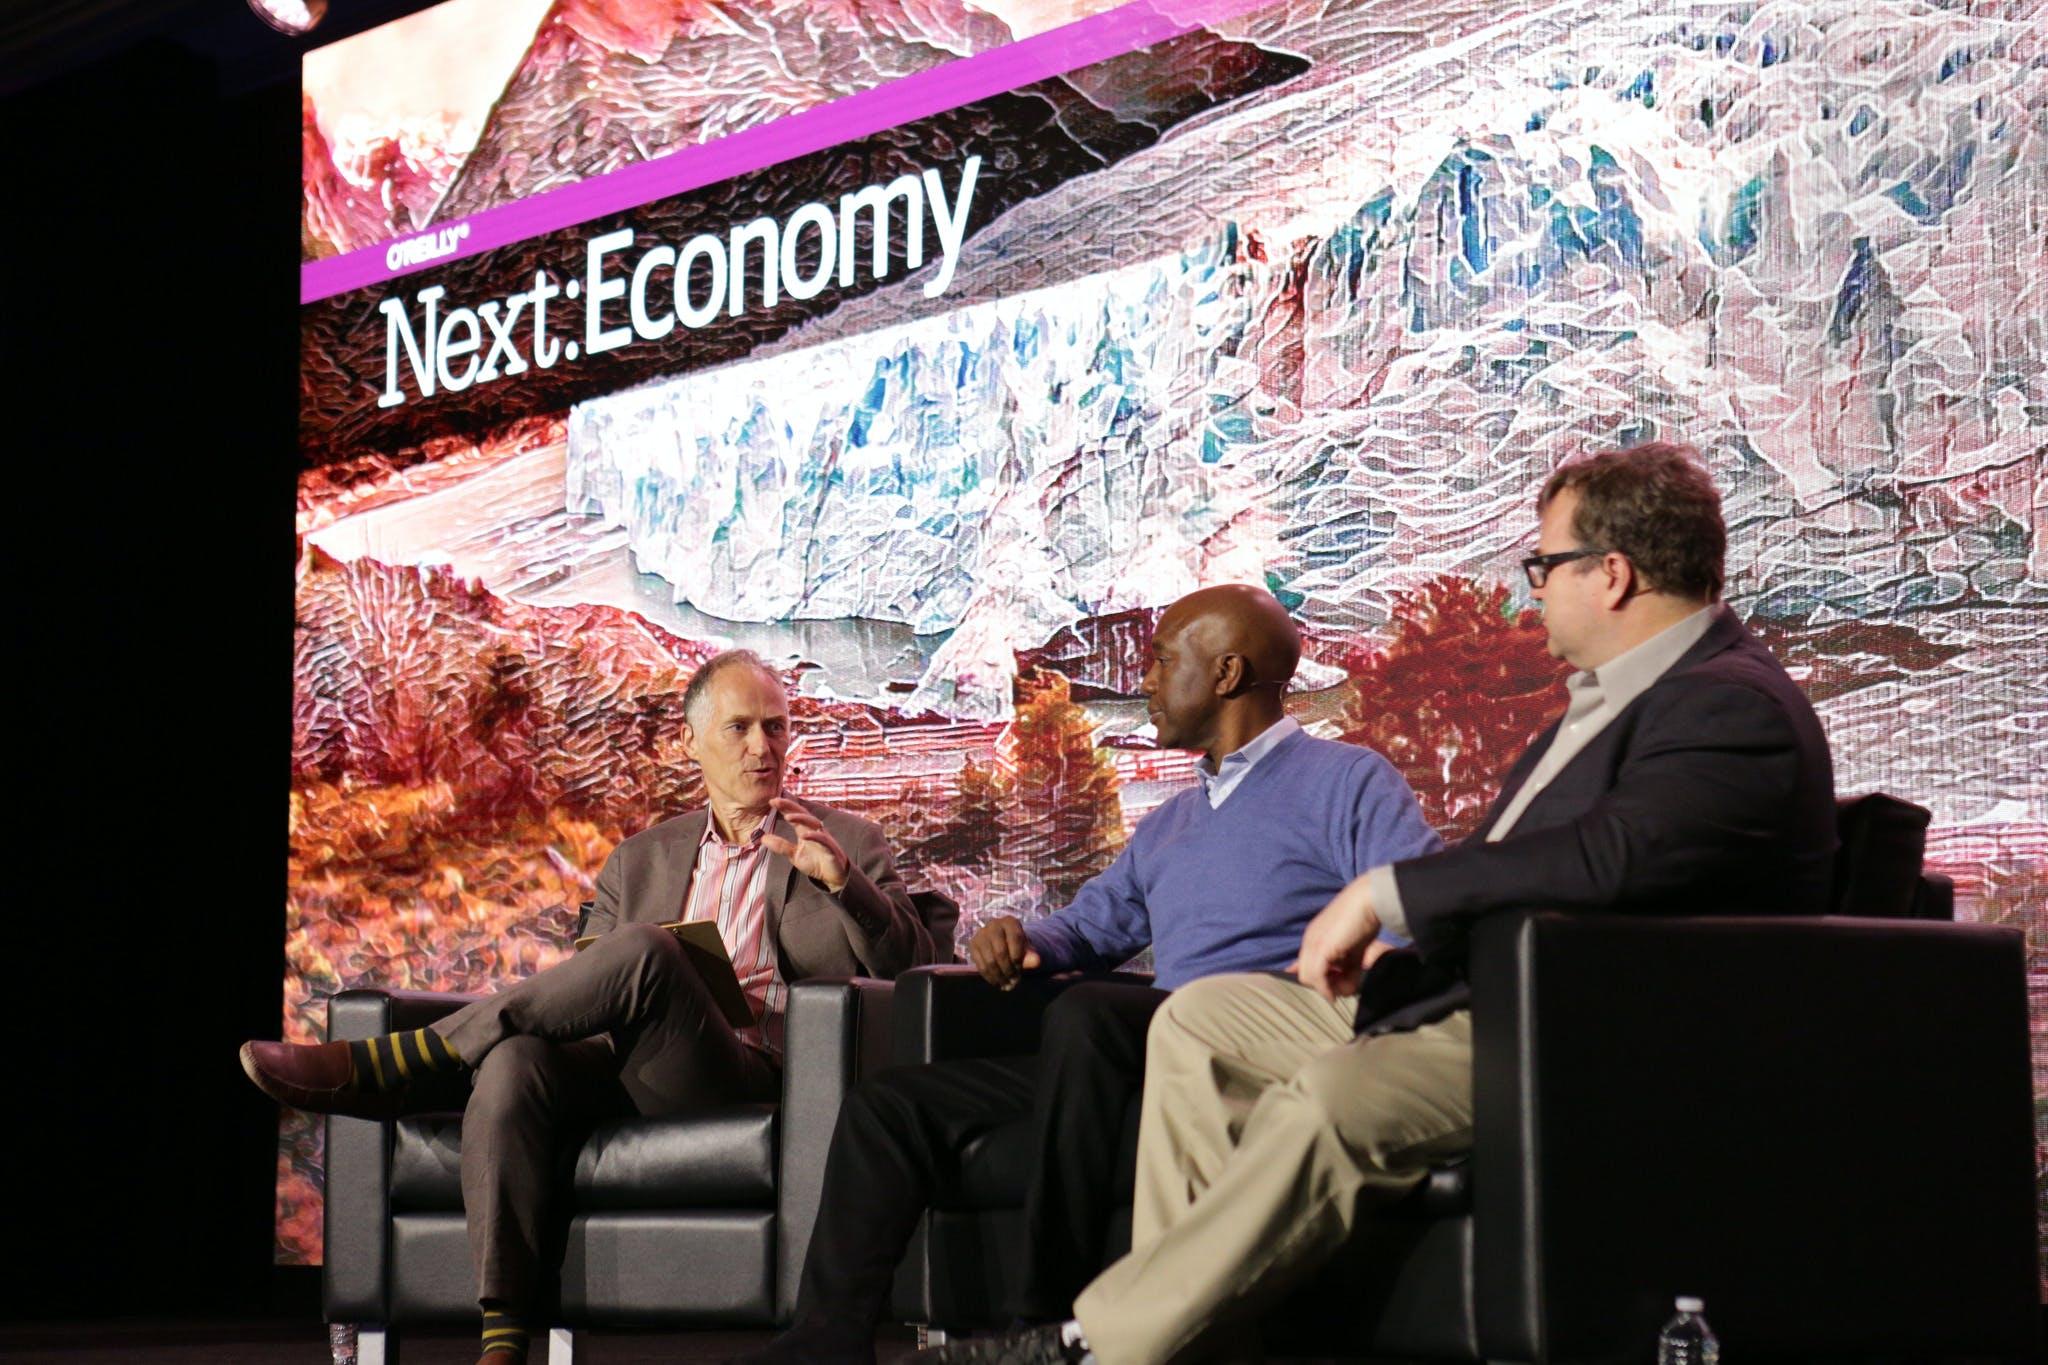 "<p><a href=""http://conferences.oreilly.com/nextcon/economy-us/public/schedule/speaker/31917"">Tim O&apos;Reilly</a><span>&nbsp;</span>(O&apos;Reilly Media, Inc.), <a href=""http://conferences.oreilly.com/nextcon/economy-us/public/schedule/speaker/212715"">James Manyika</a> (McKinsey &amp; Company) and <span>&nbsp;</span><a href=""http://conferences.oreilly.com/nextcon/economy-us/public/schedule/speaker/64090"">Reid Hoffman</a><span>&nbsp;</span>(LinkedIn   Greylock Partners) speak at <em><a href=""https://www.flickr.com/photos/oreillyconf/sets/72157673871990430/with/29621994914/"">Next:Economy SF 2016</a>.</em></p>"